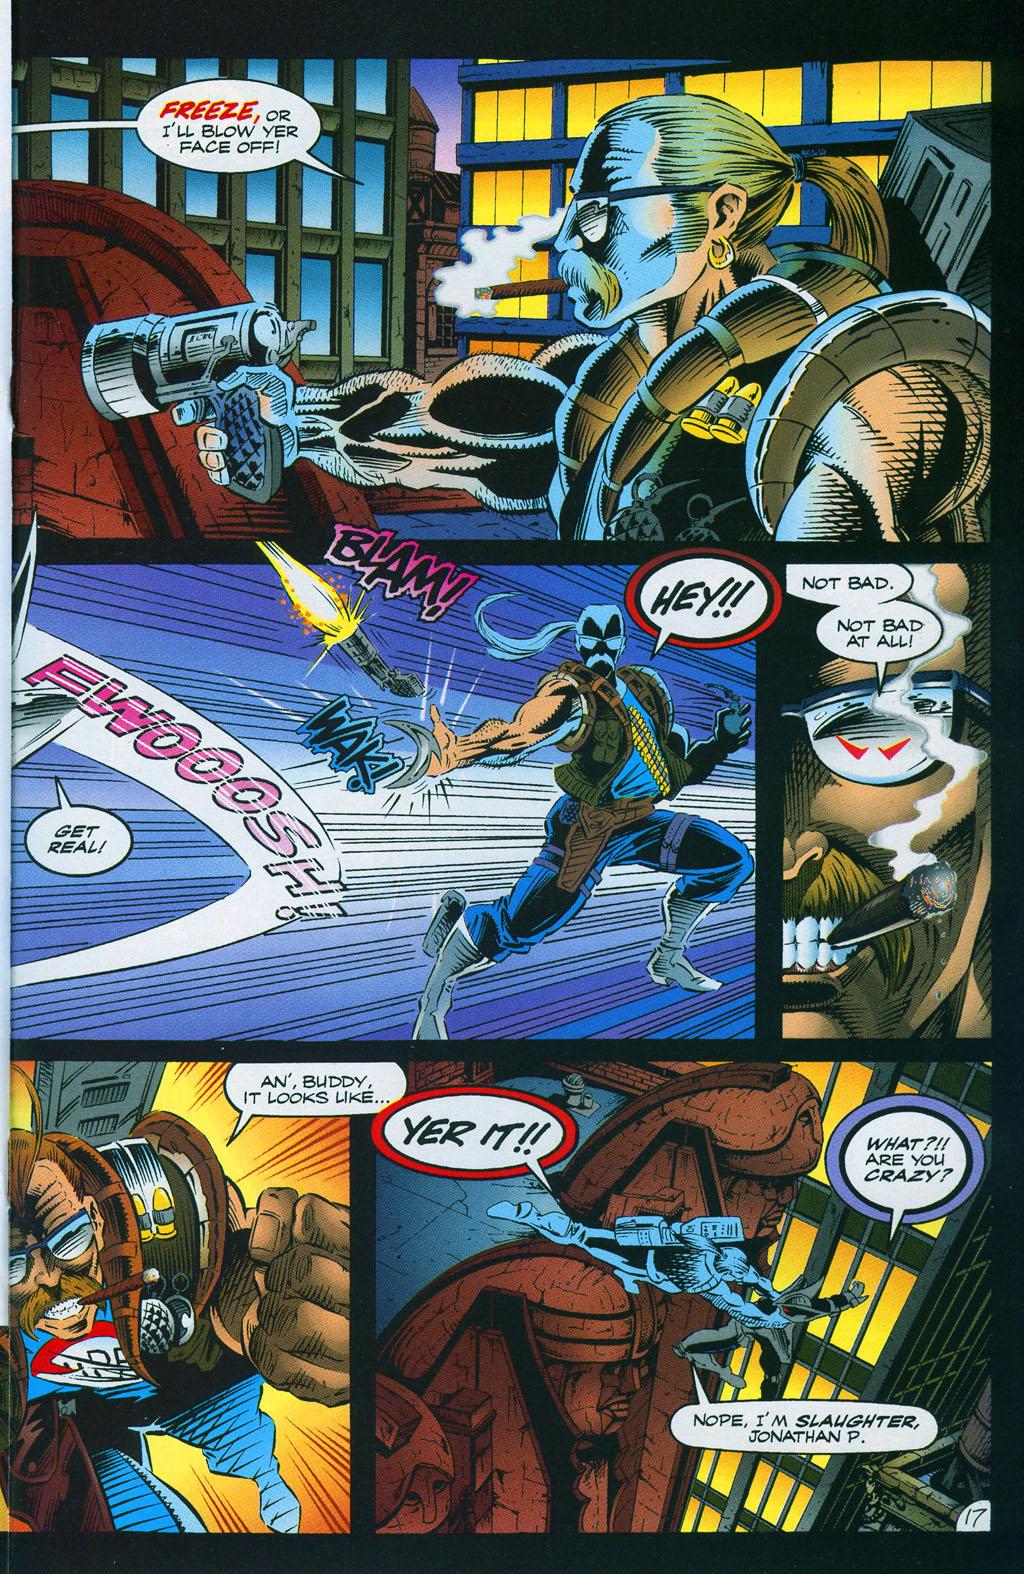 Read online ShadowHawk comic -  Issue #7 - 24